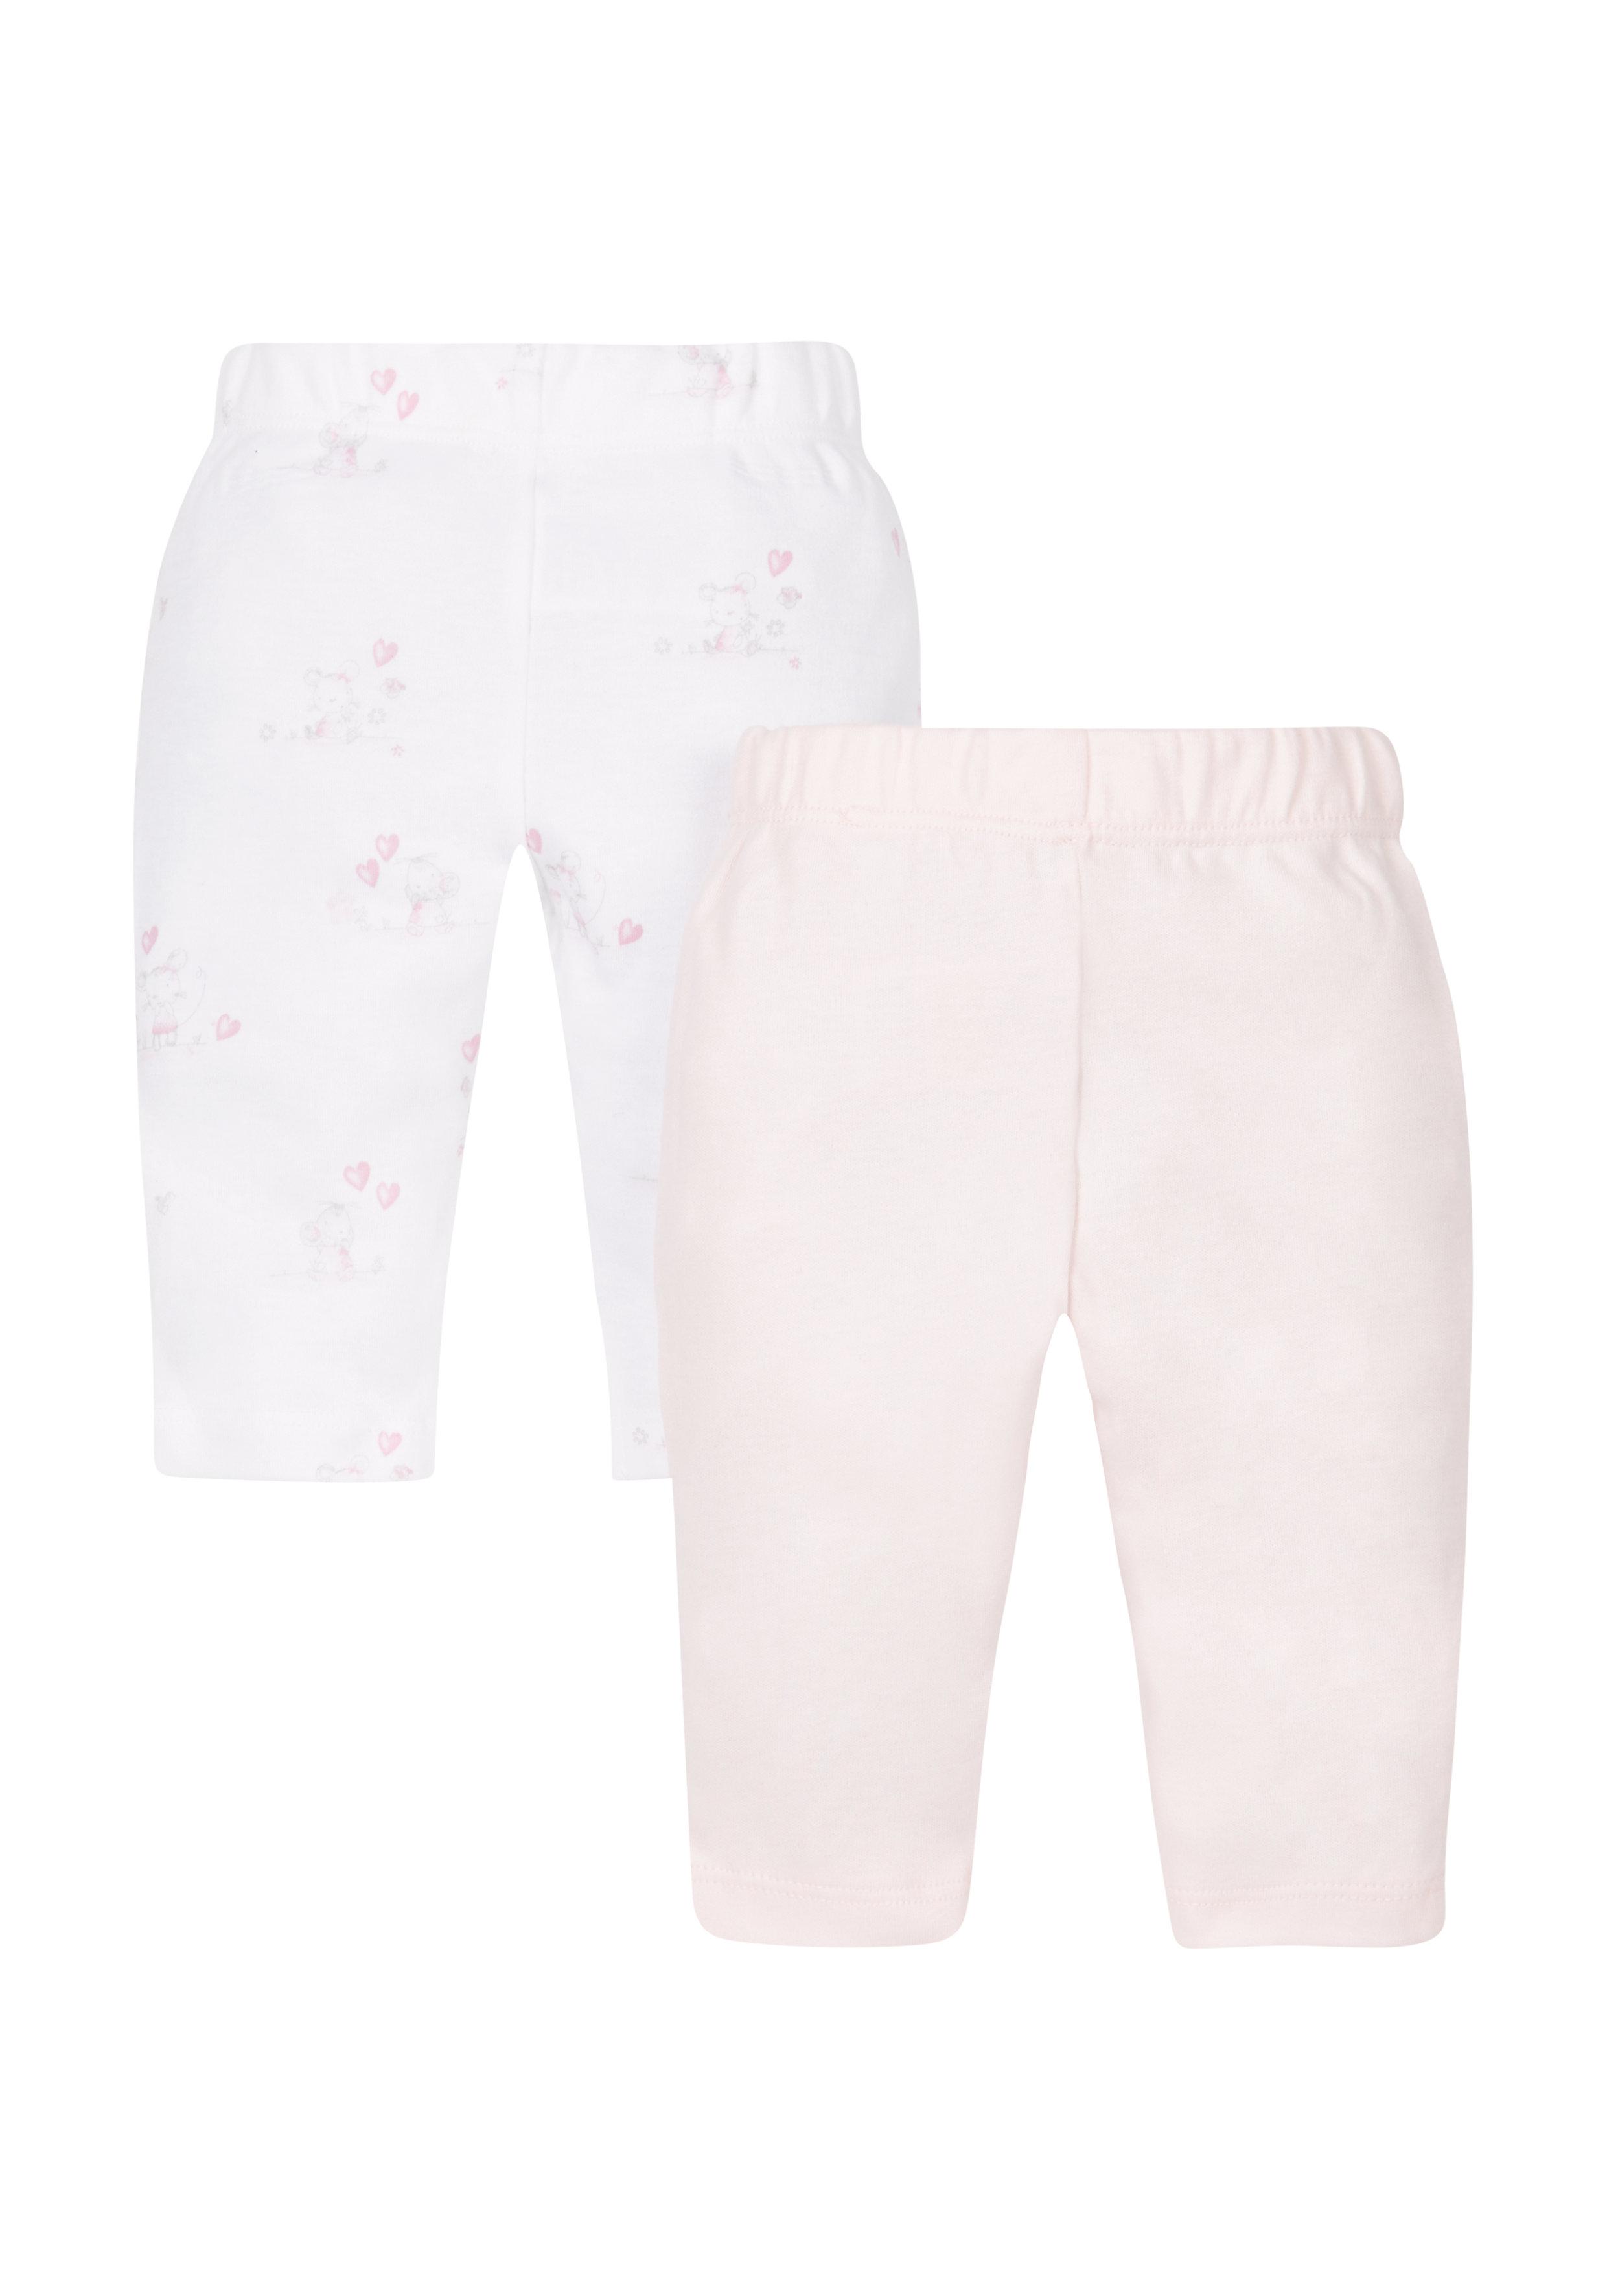 Mothercare | Girls Floral Leggings - 2 Pack - Pink